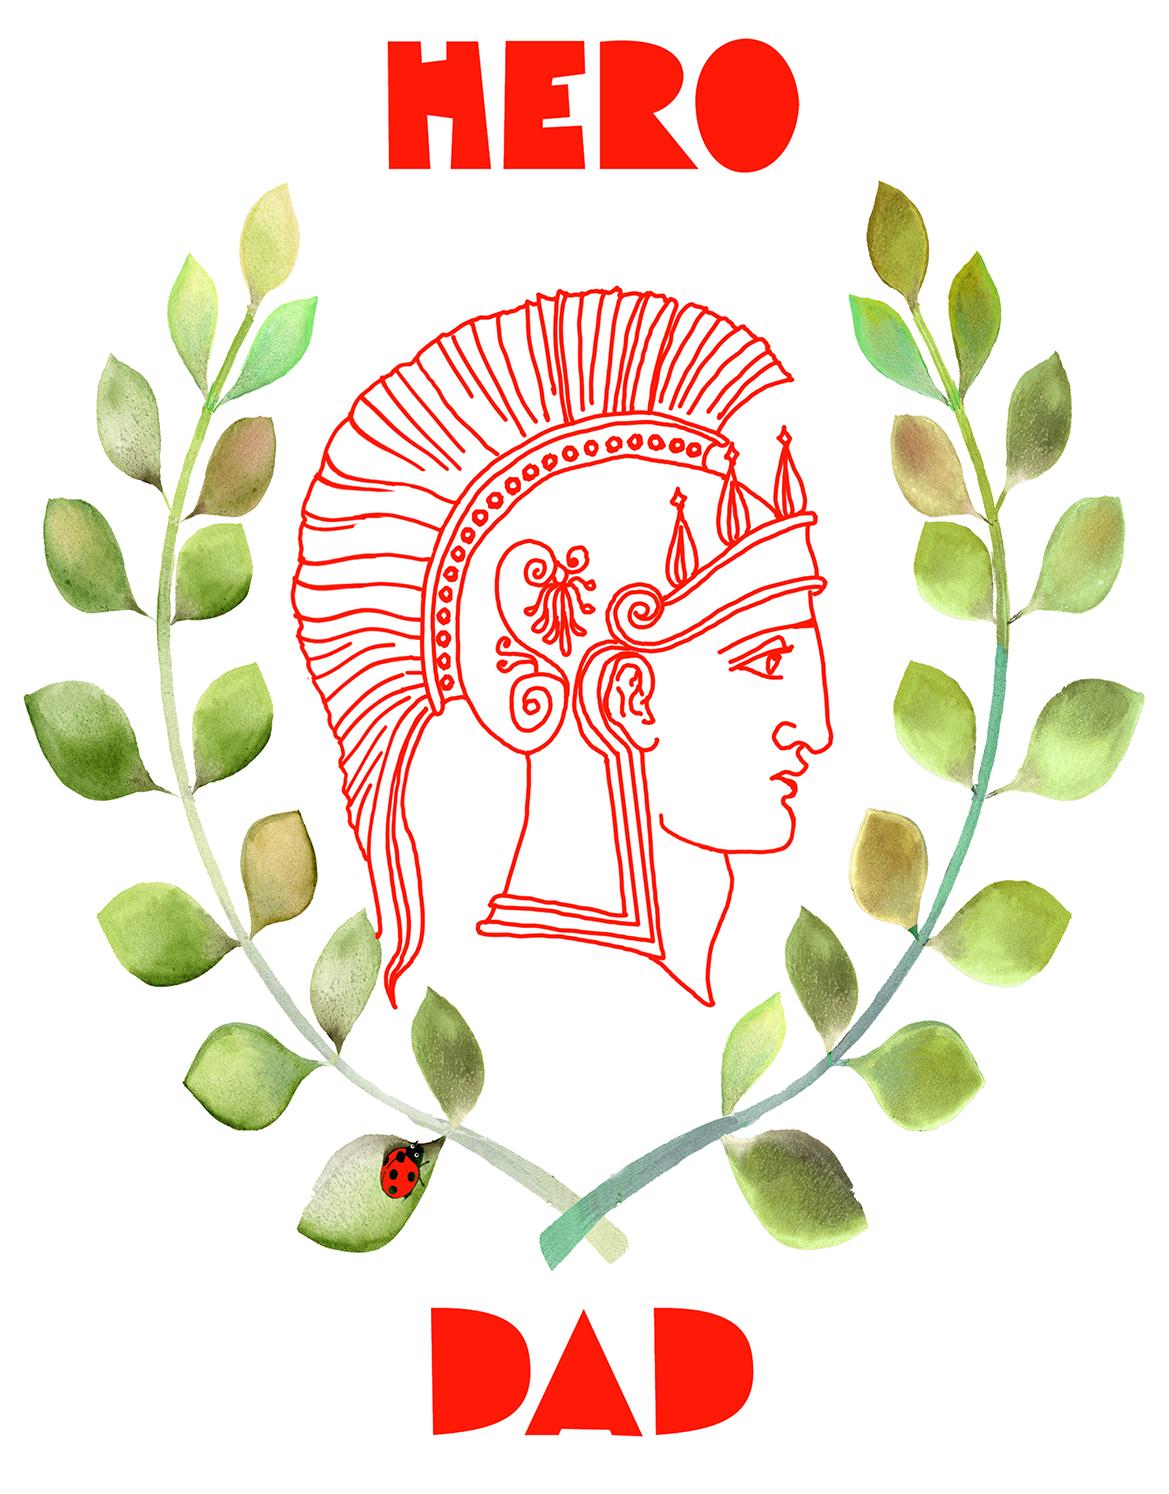 greek helmet profile hero dad greeting card by masha dyans